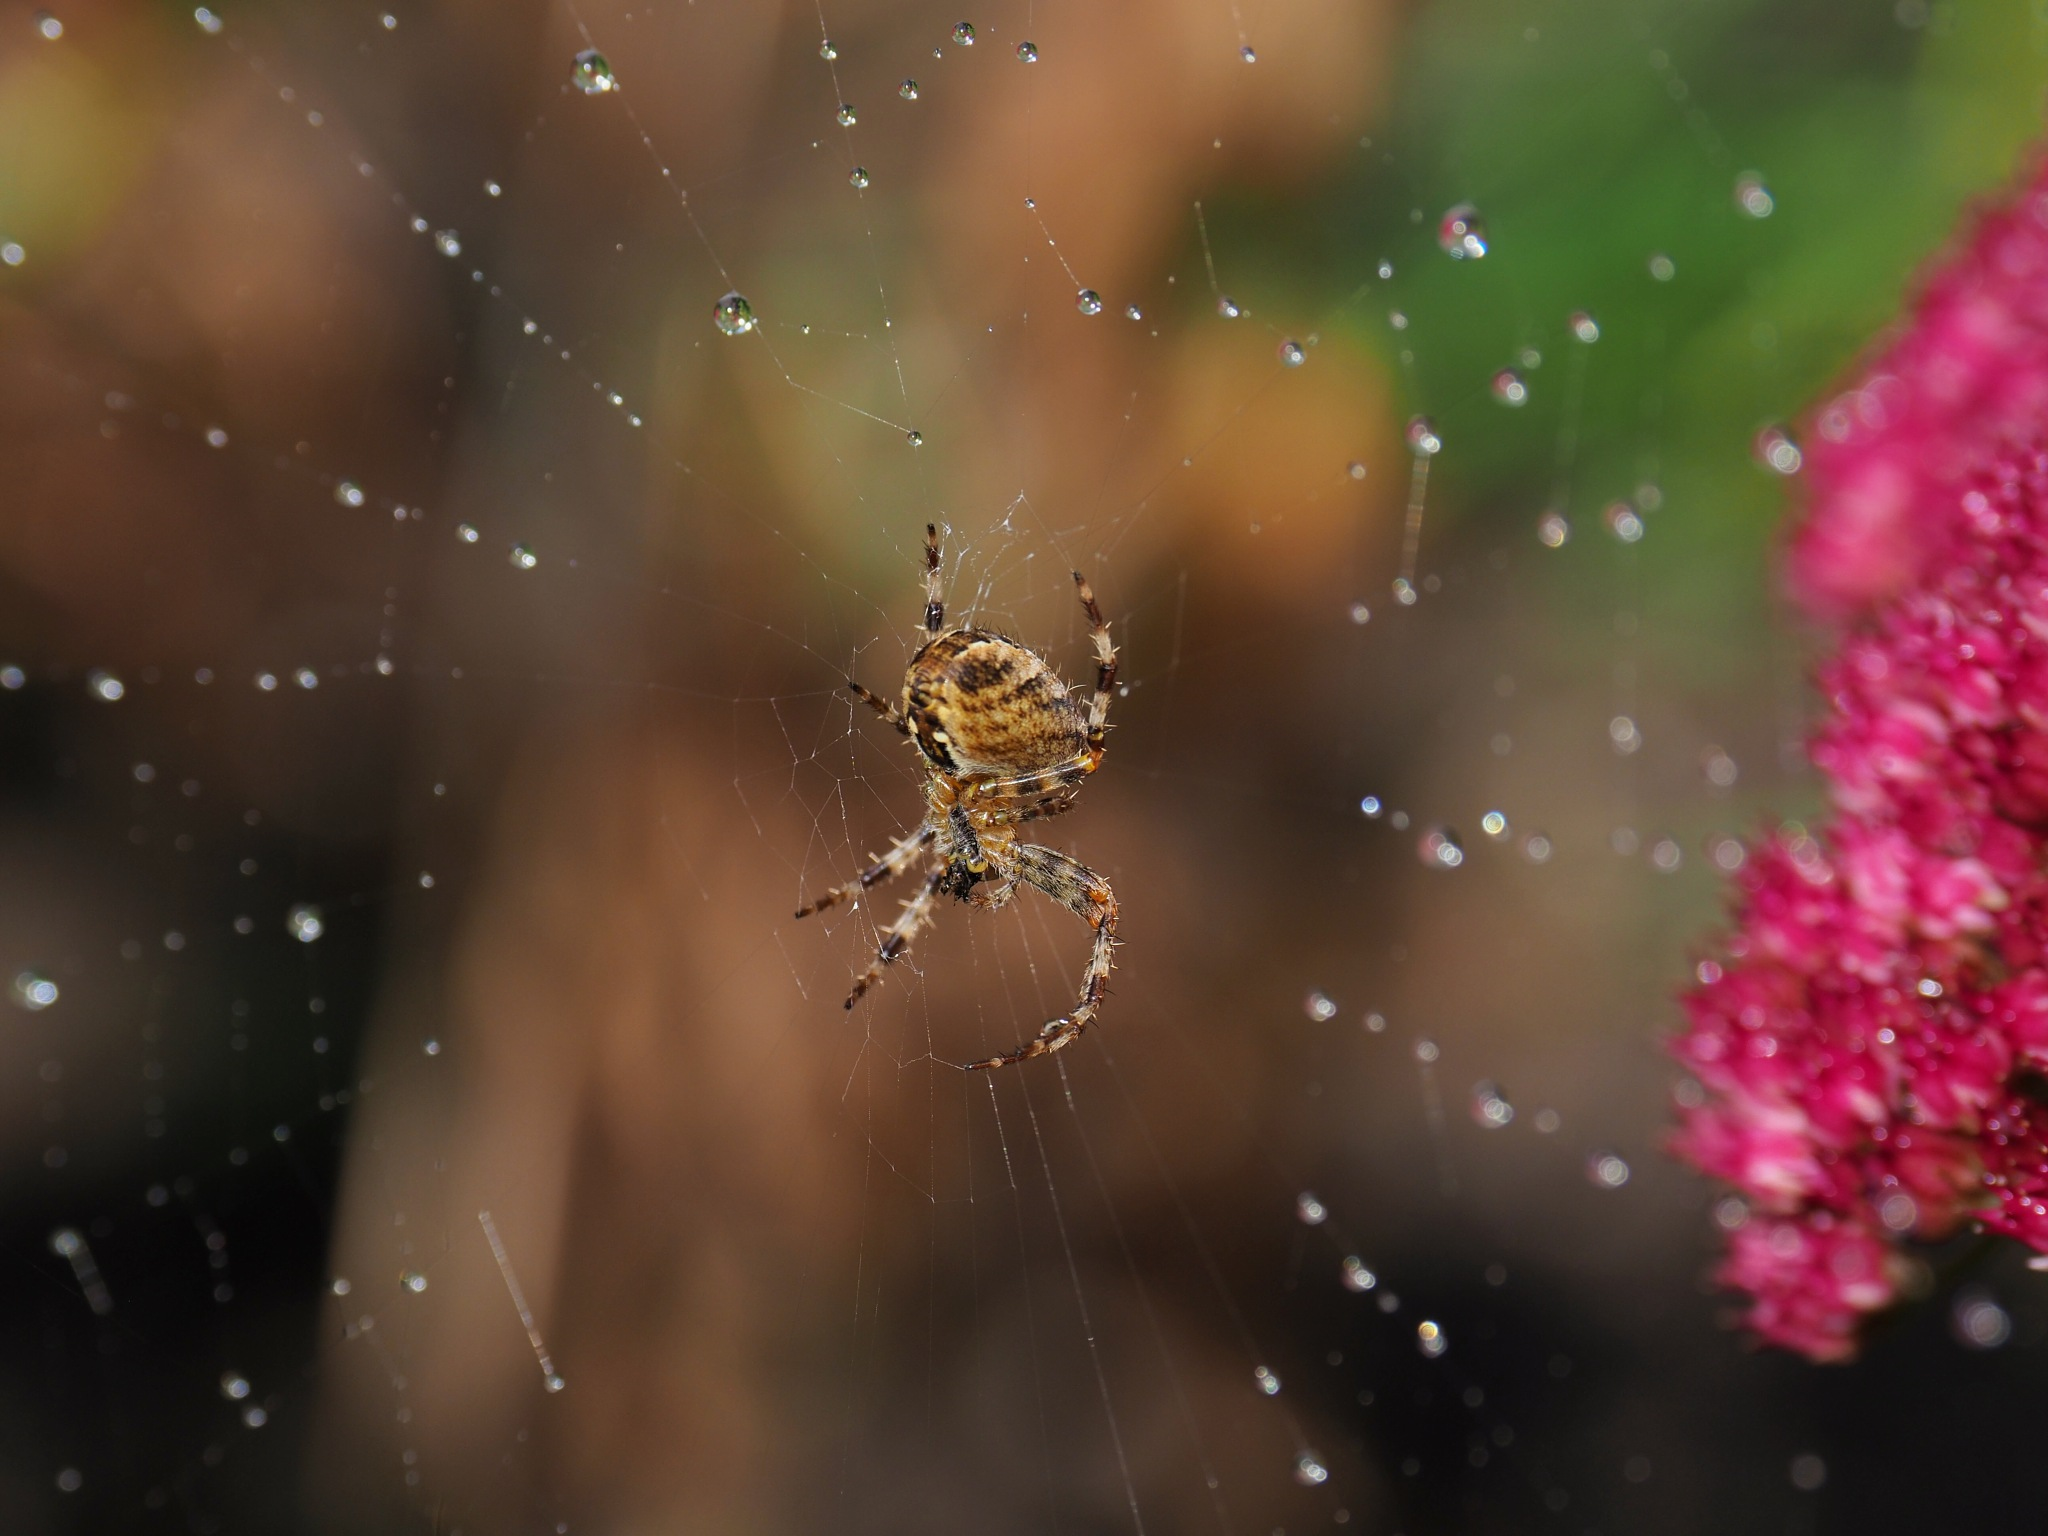 Garden Spider by john.bradburn